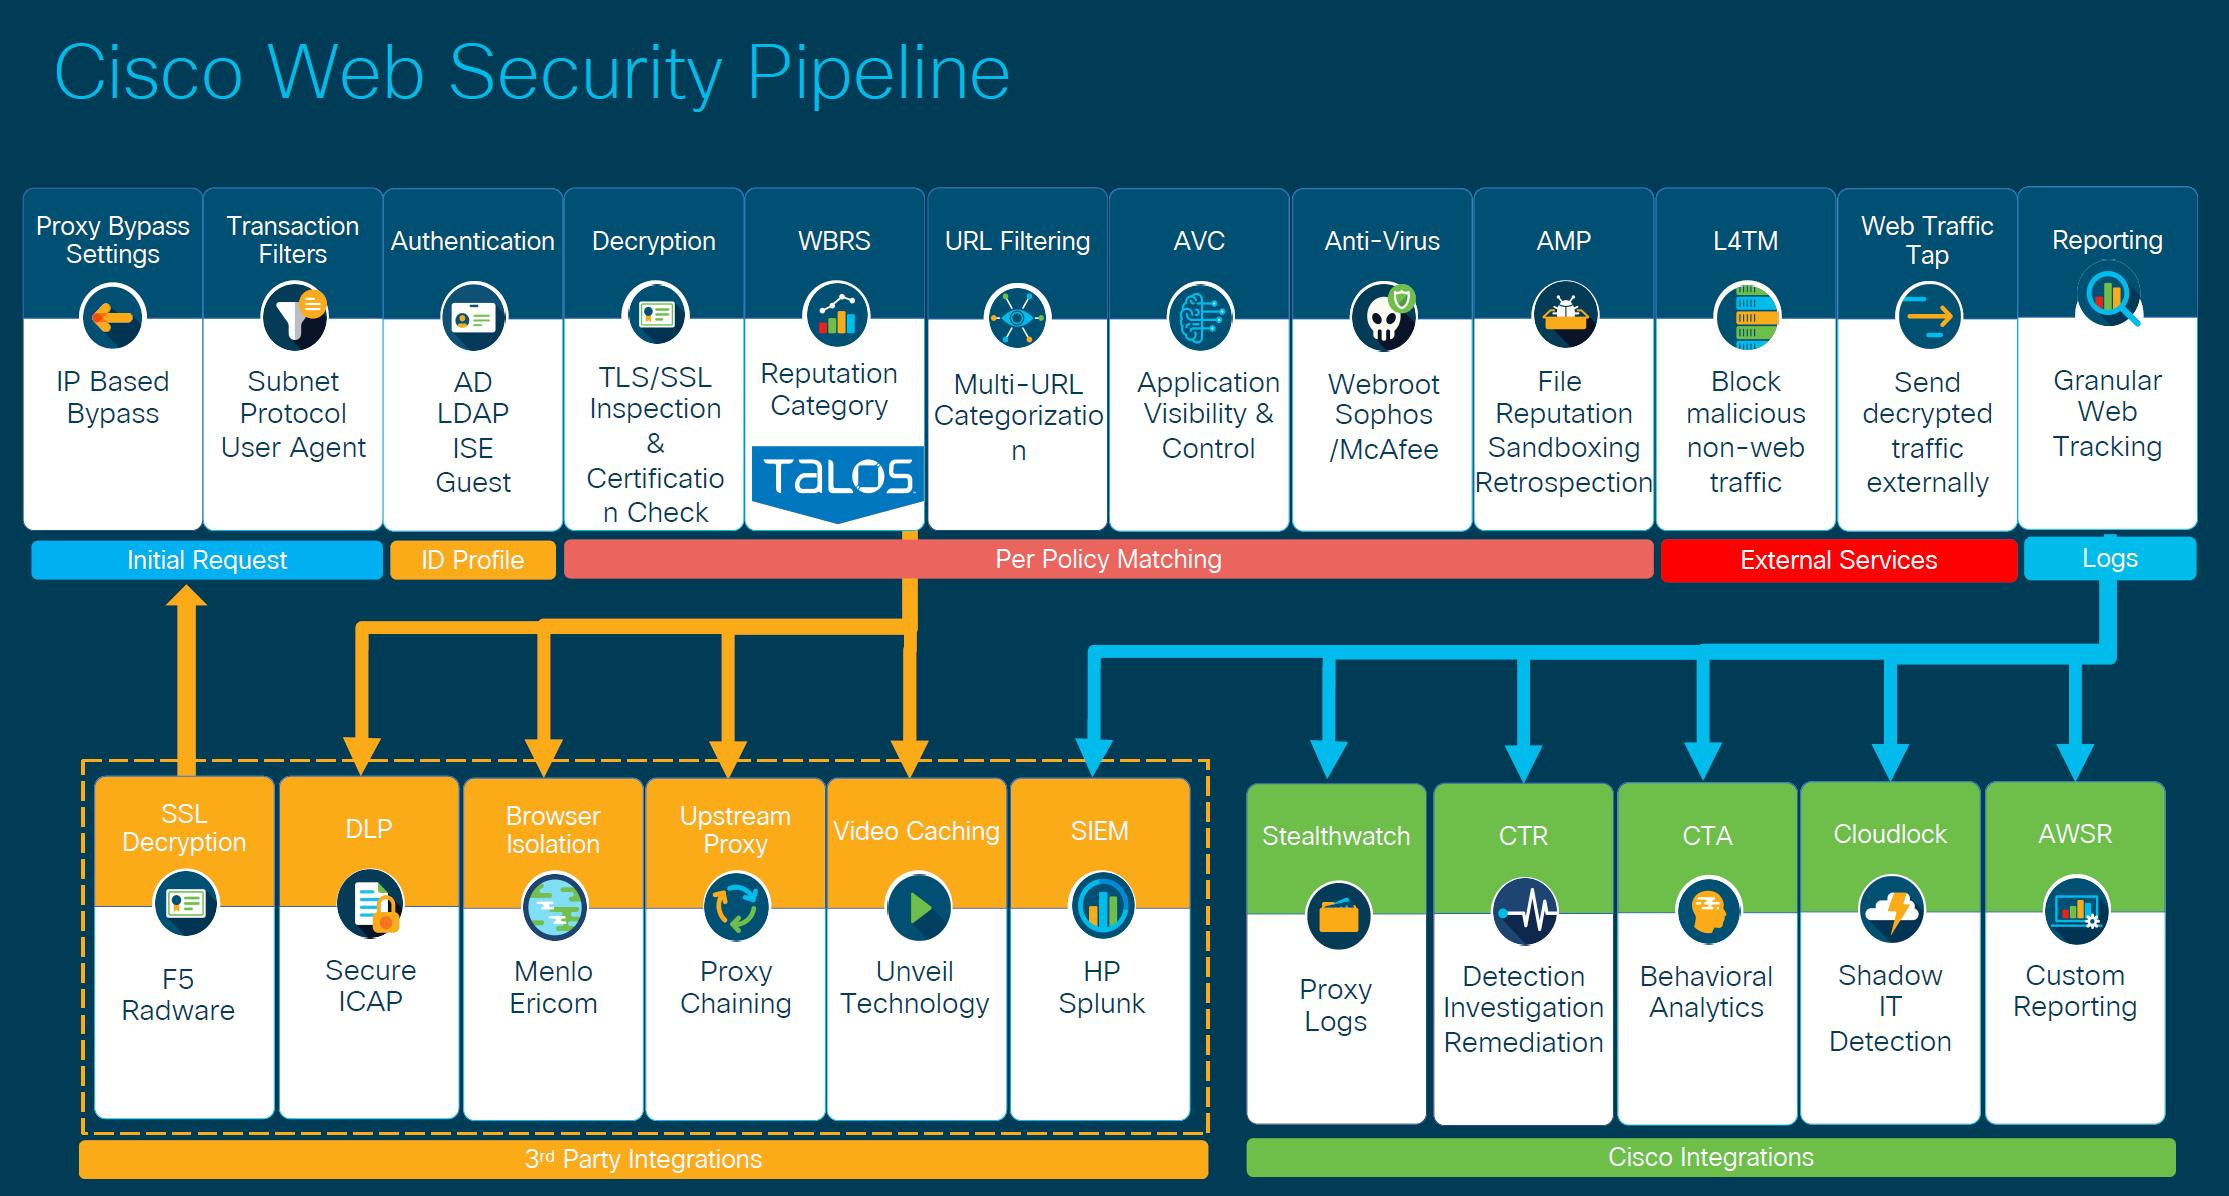 Cisco Web Security Pipeline